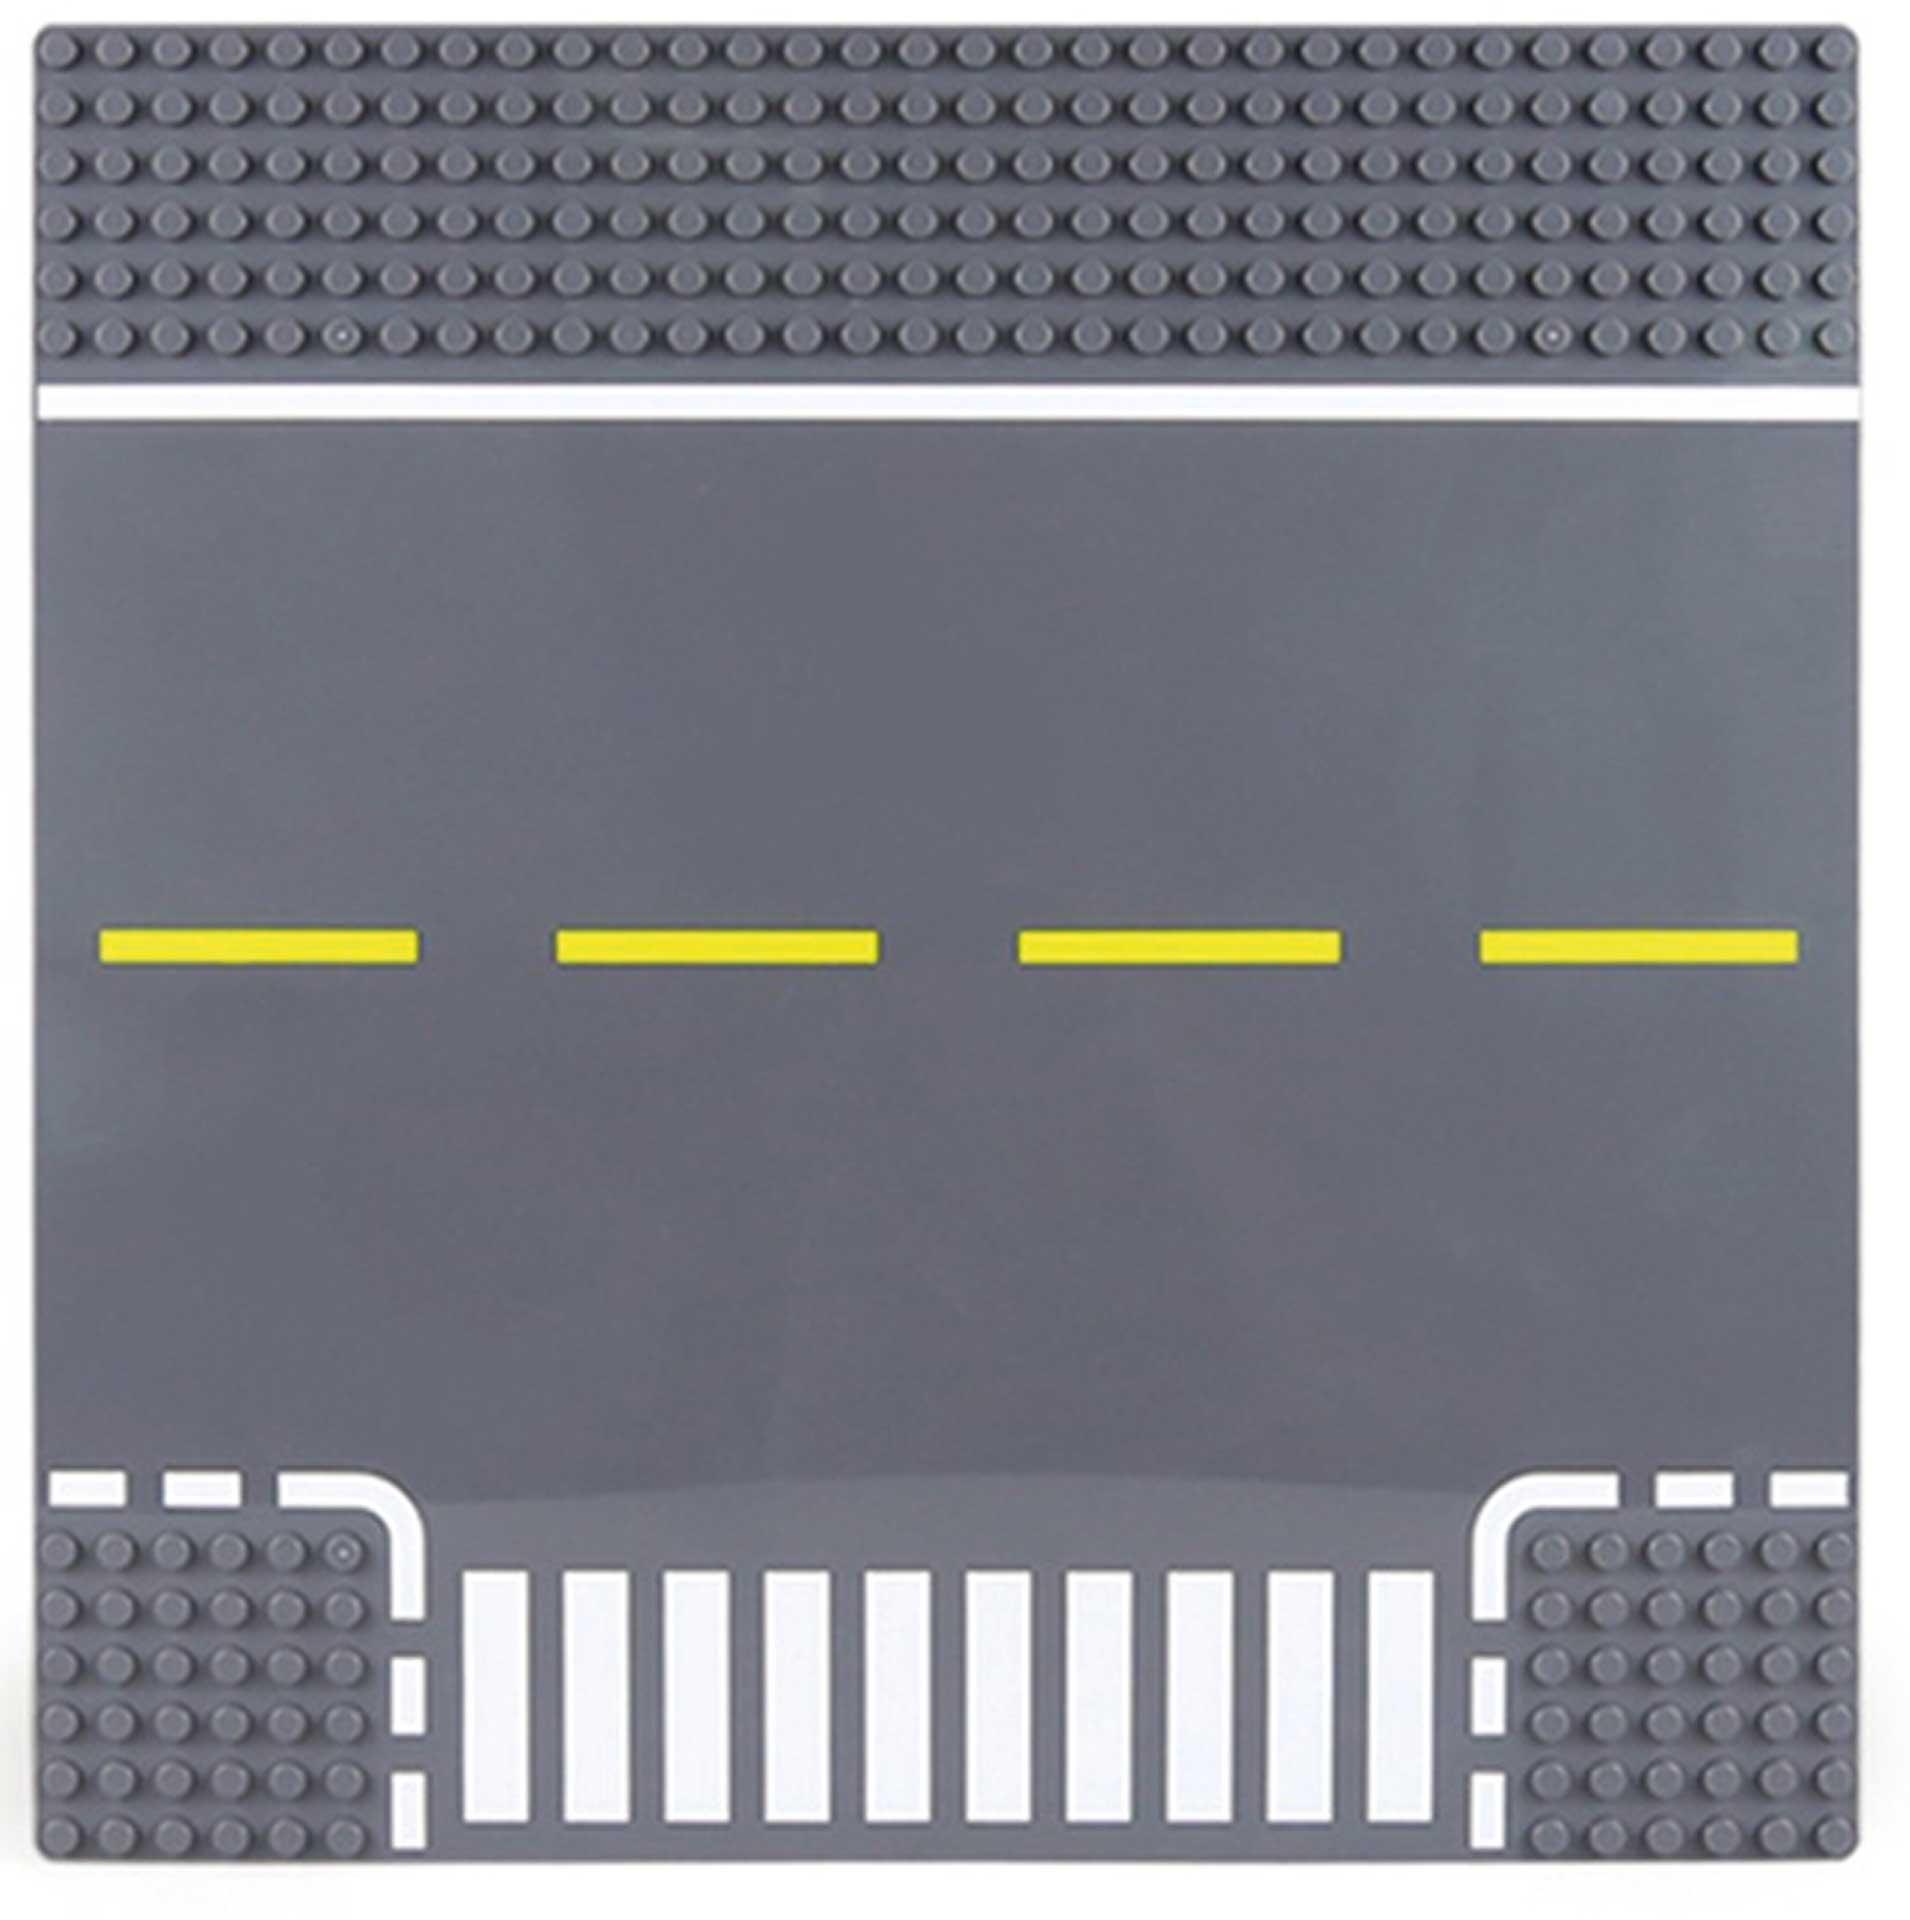 Wange Grundplatte Straße T-Kreuzung 32x32 Nopp 25,5cm x 25,5cm